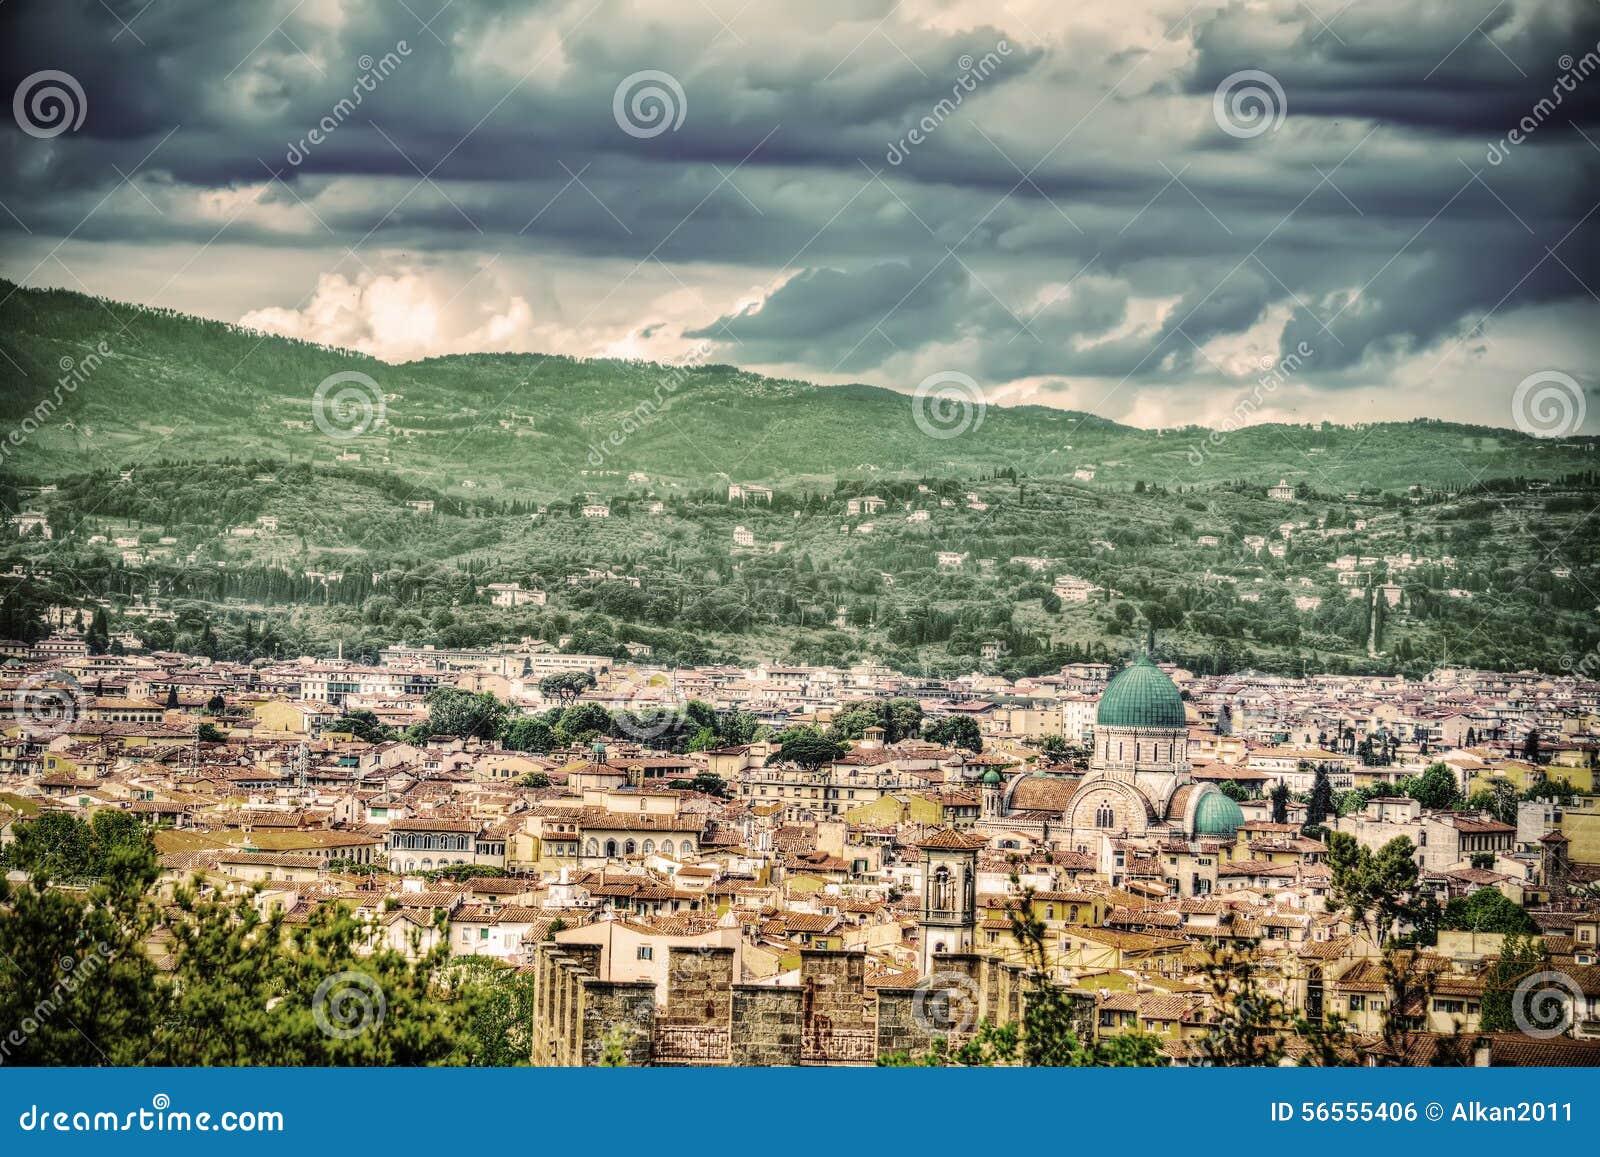 Download Πανόραμα της Φλωρεντίας στην εκλεκτής ποιότητας επίδραση τόνου Στοκ Εικόνες - εικόνα από πόλη, ιταλικά: 56555406